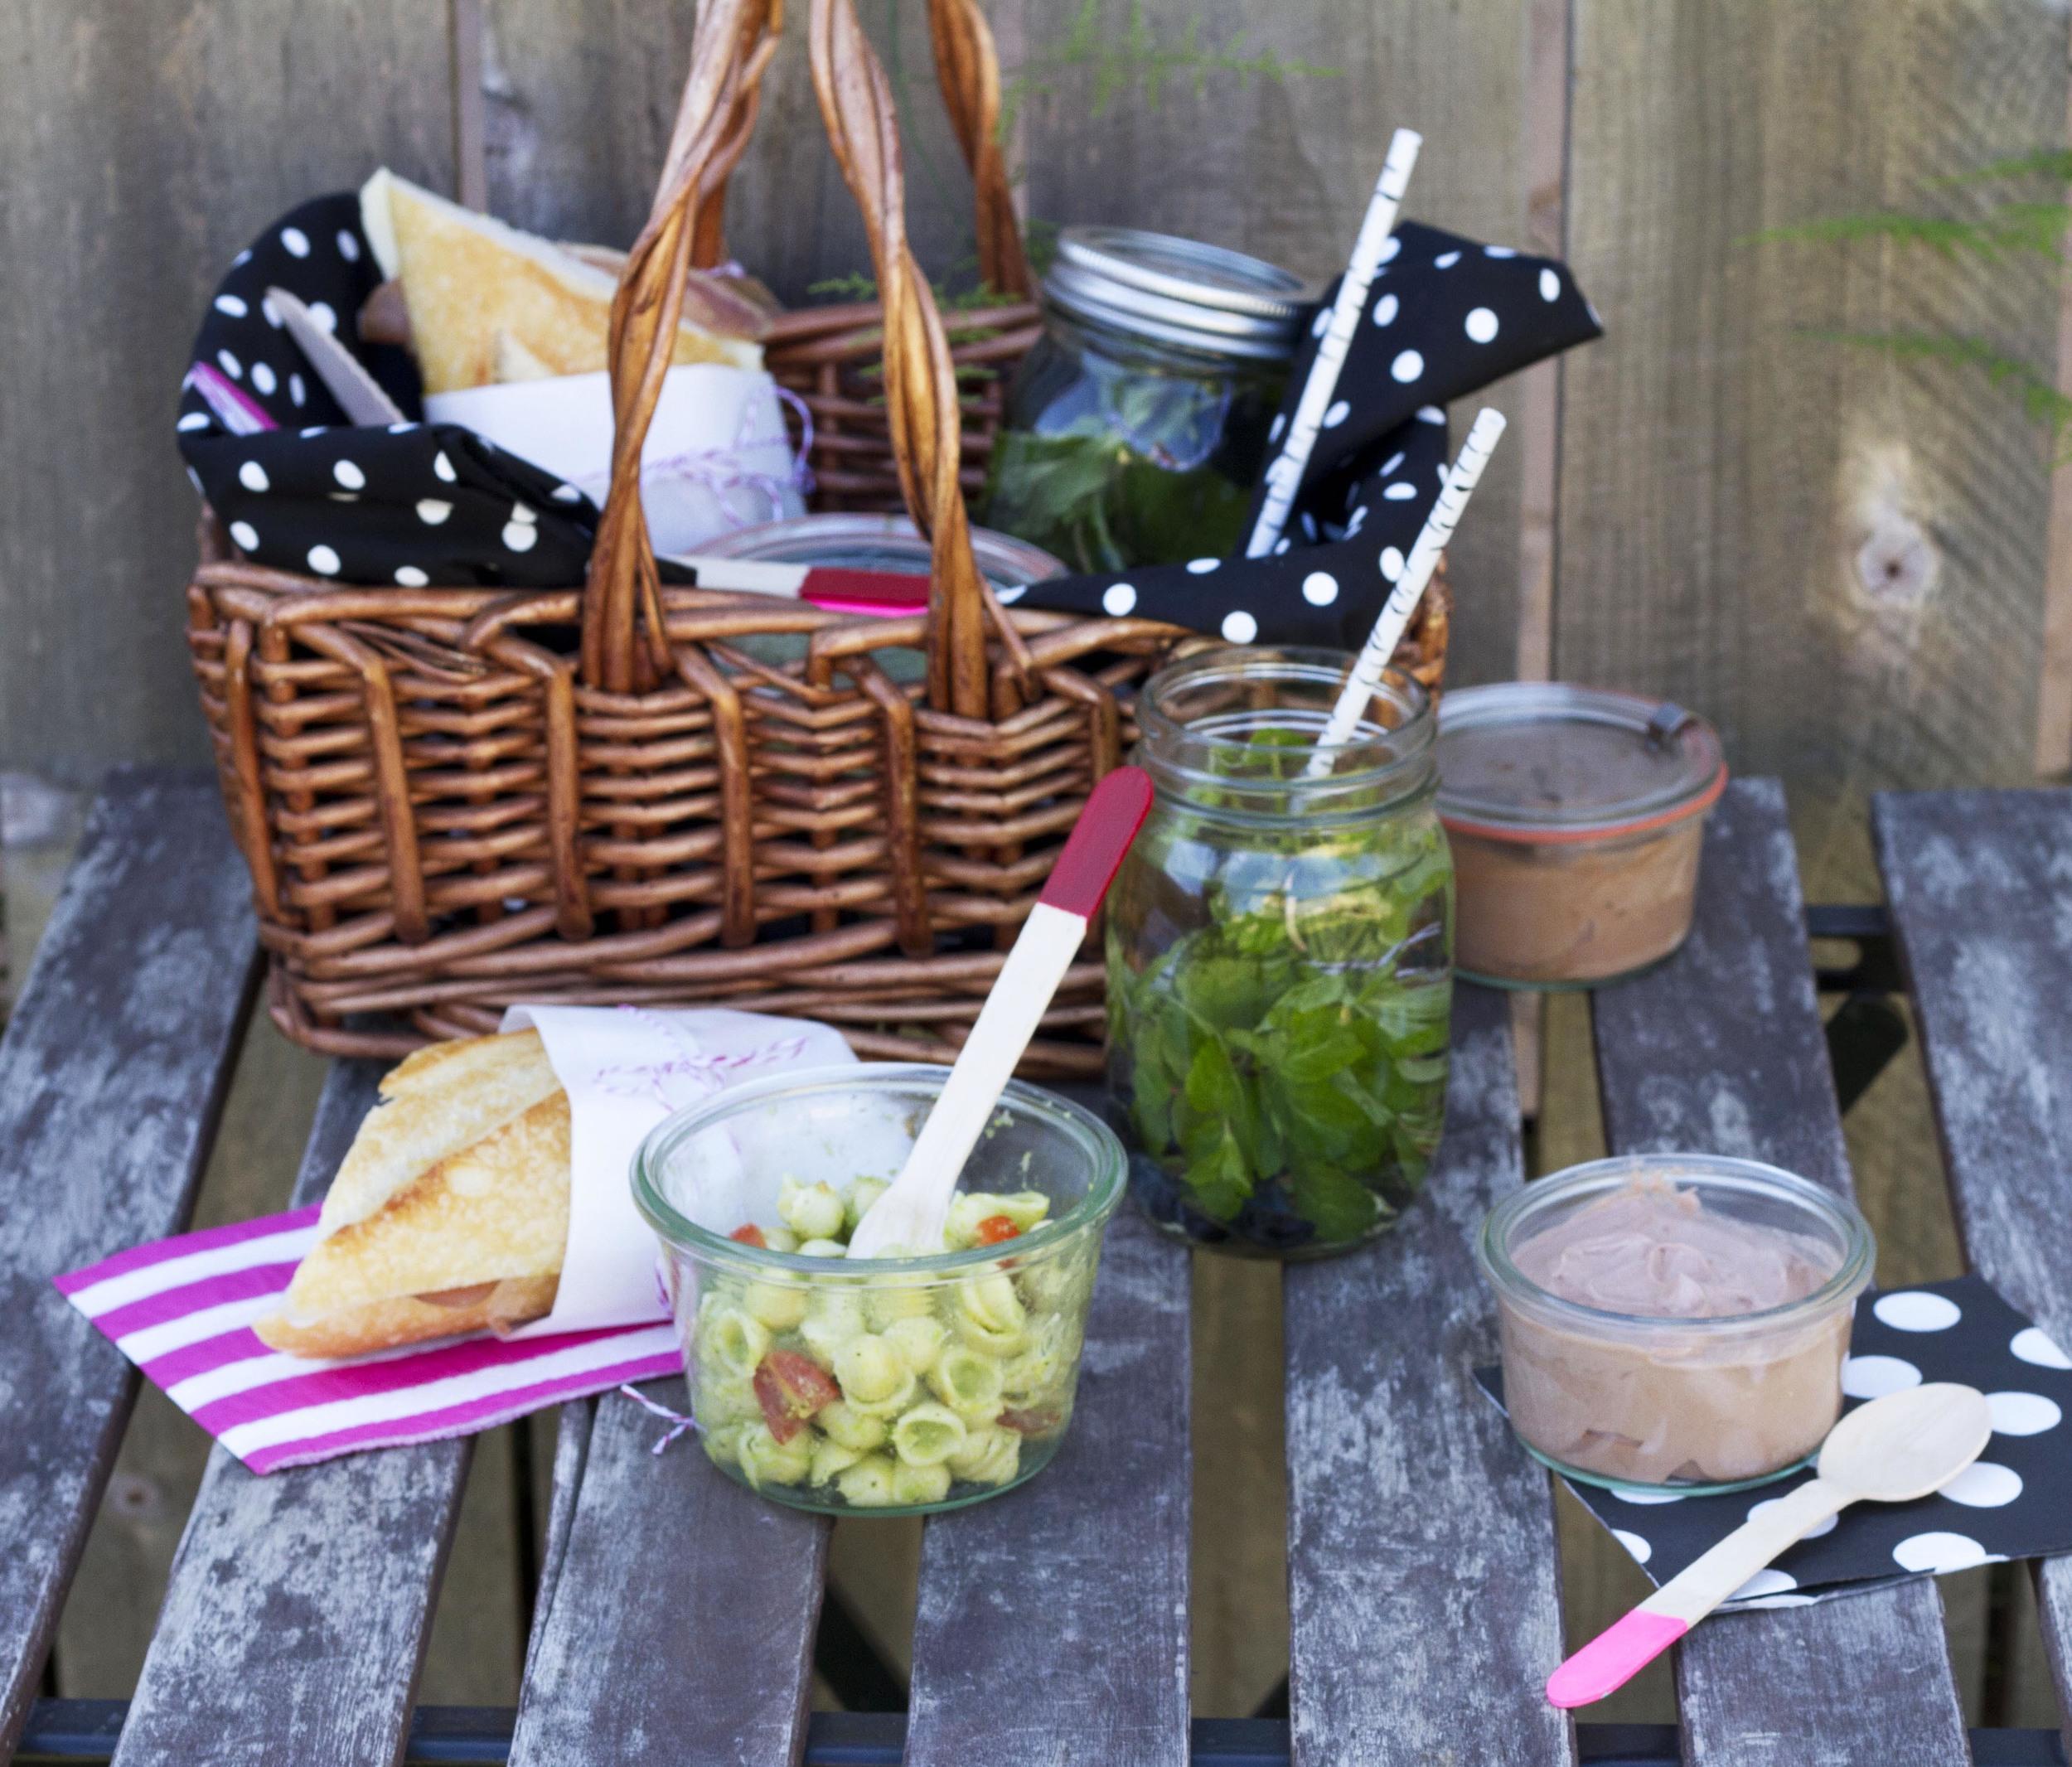 picnic on table 2.jpg